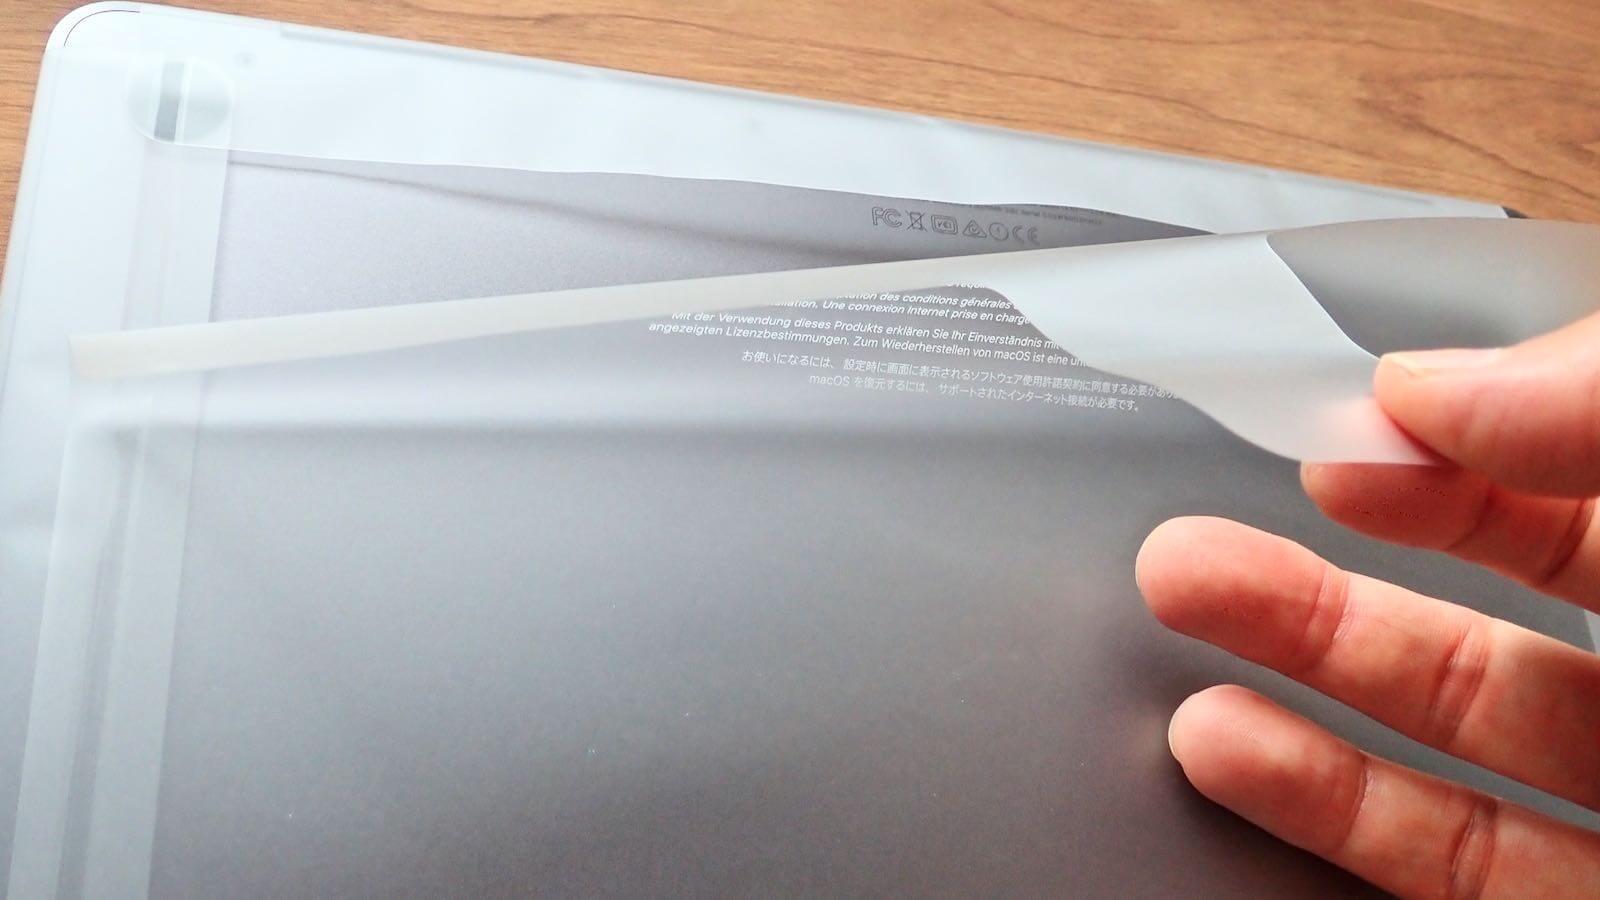 0202 Apple maintenance item Quality MacBook 2017 12inch 009